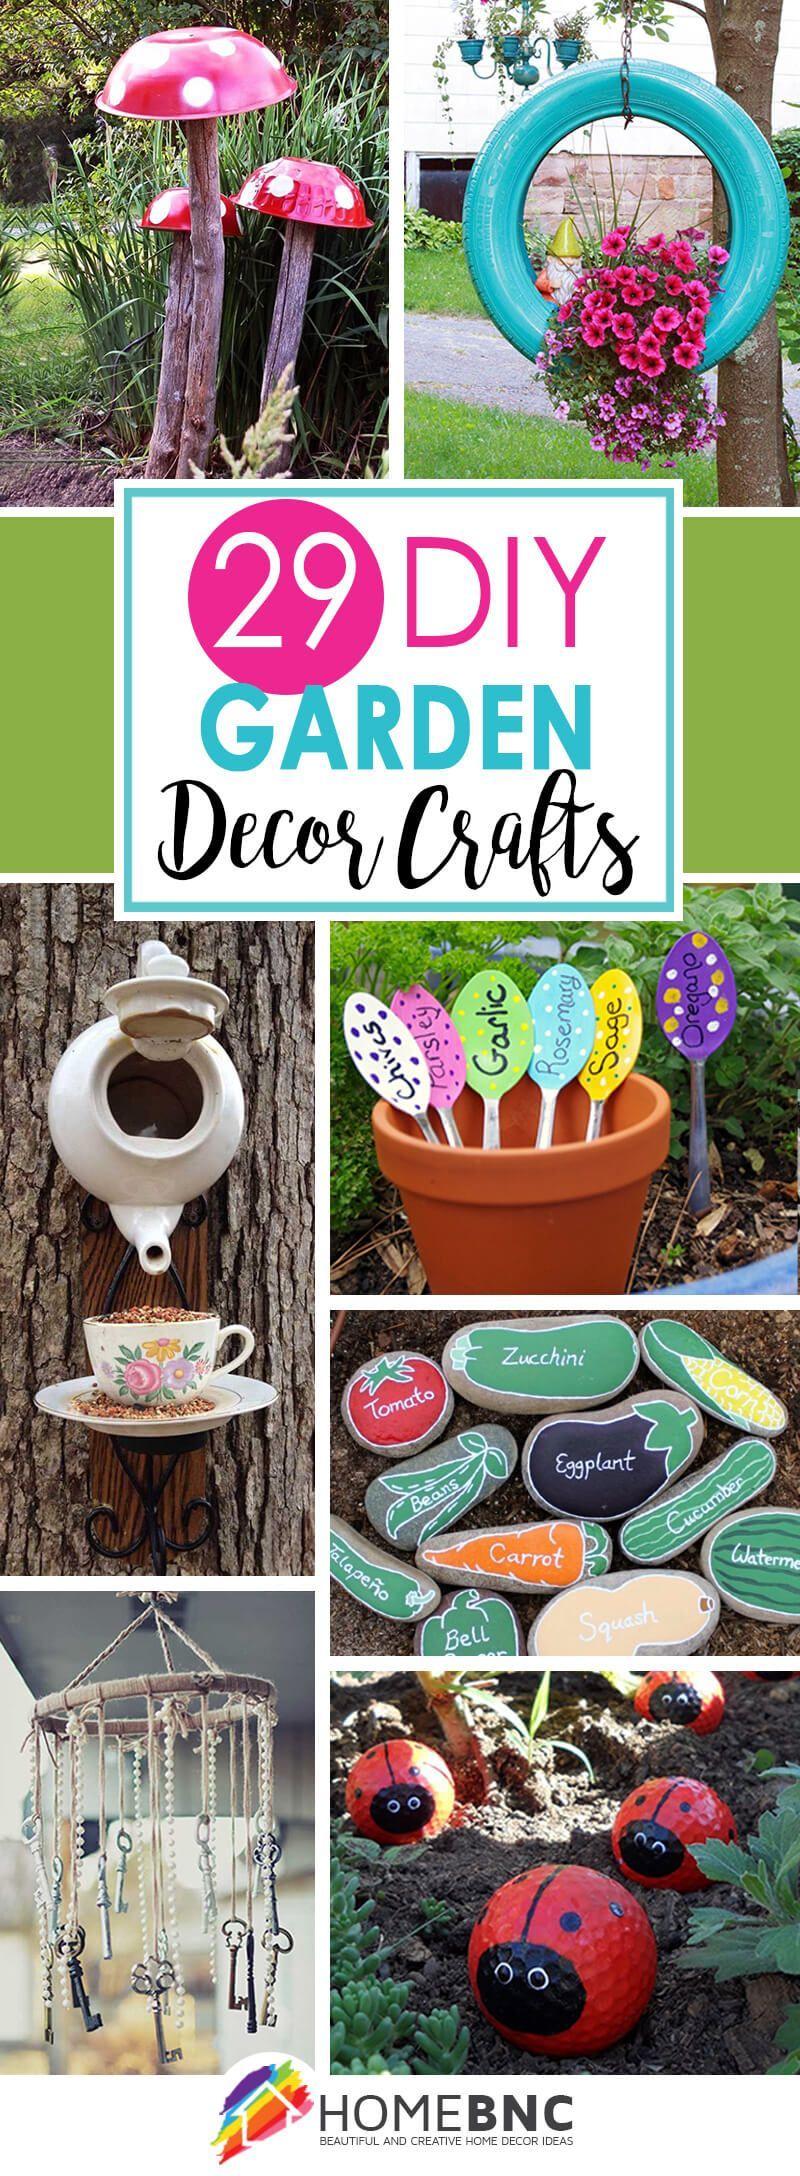 DIY Garden Craft Ideas | outdoor classroom | Pinterest | Gardens ...